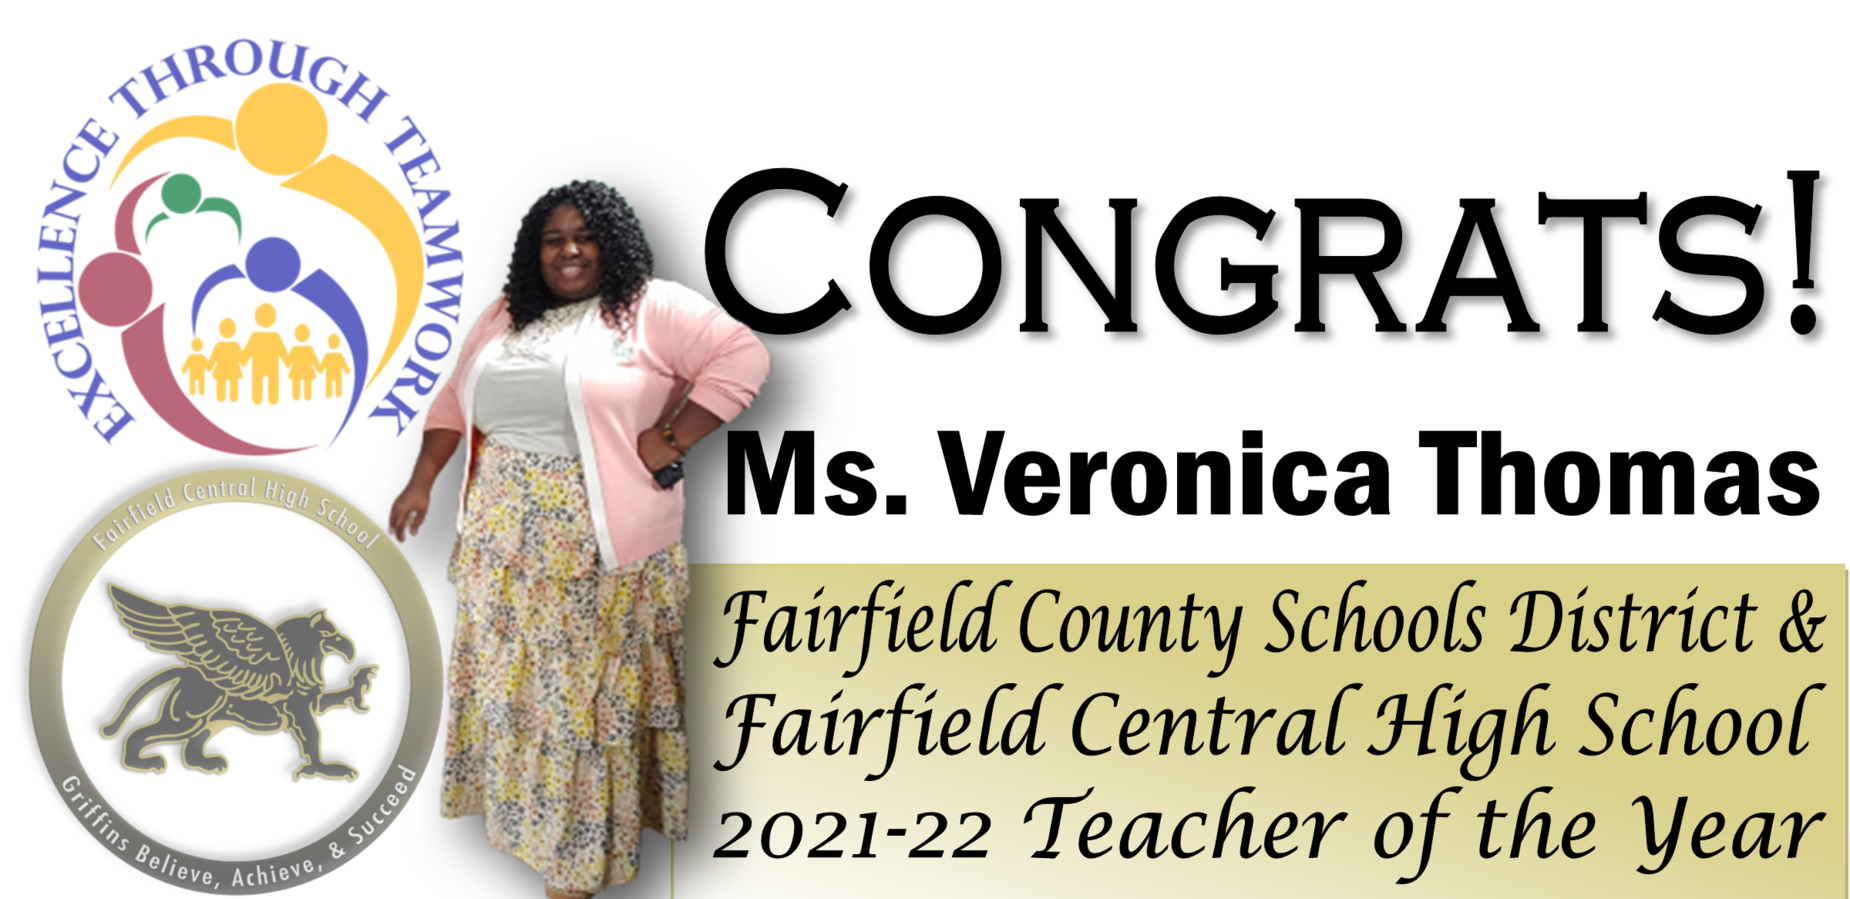 CONGRATS! MS. VERONICA THOMAS FAIRFIELD COUNTY SCHOOLS DISTRICT & FAIRFIELD CENTRAL HIGH SCHOOL 2021-22 TEACHER OF THE YEAR